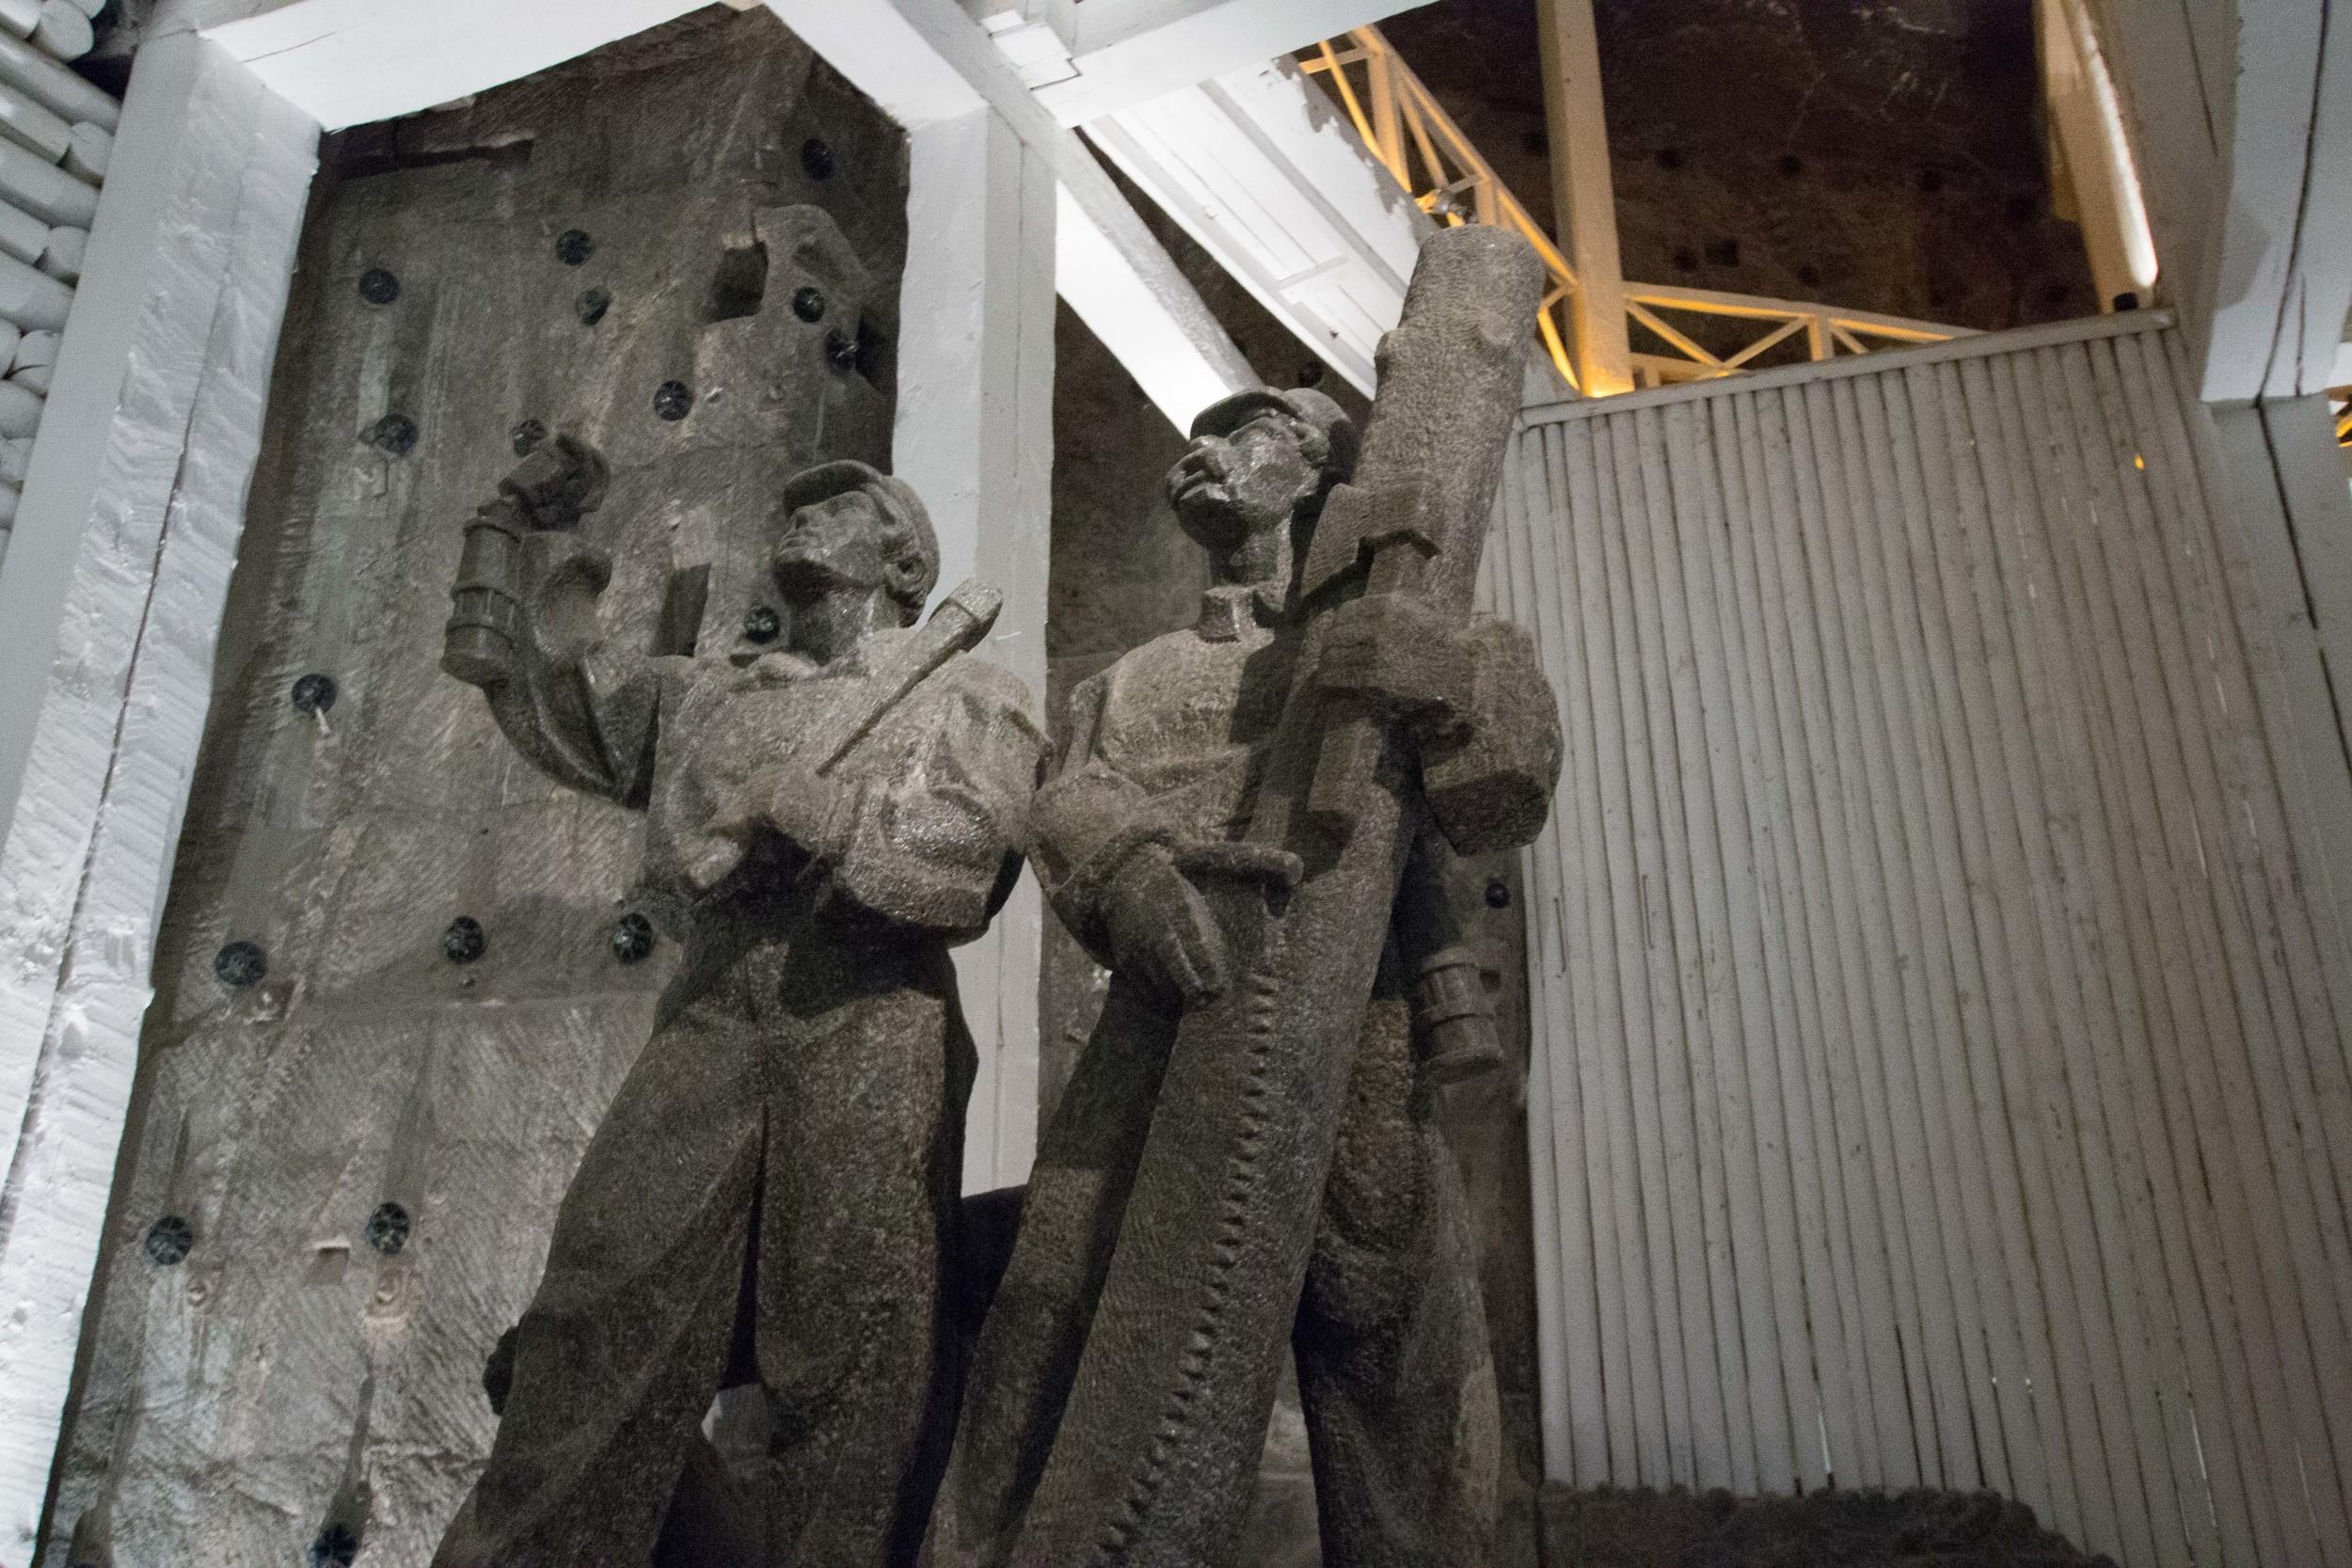 Miner statues